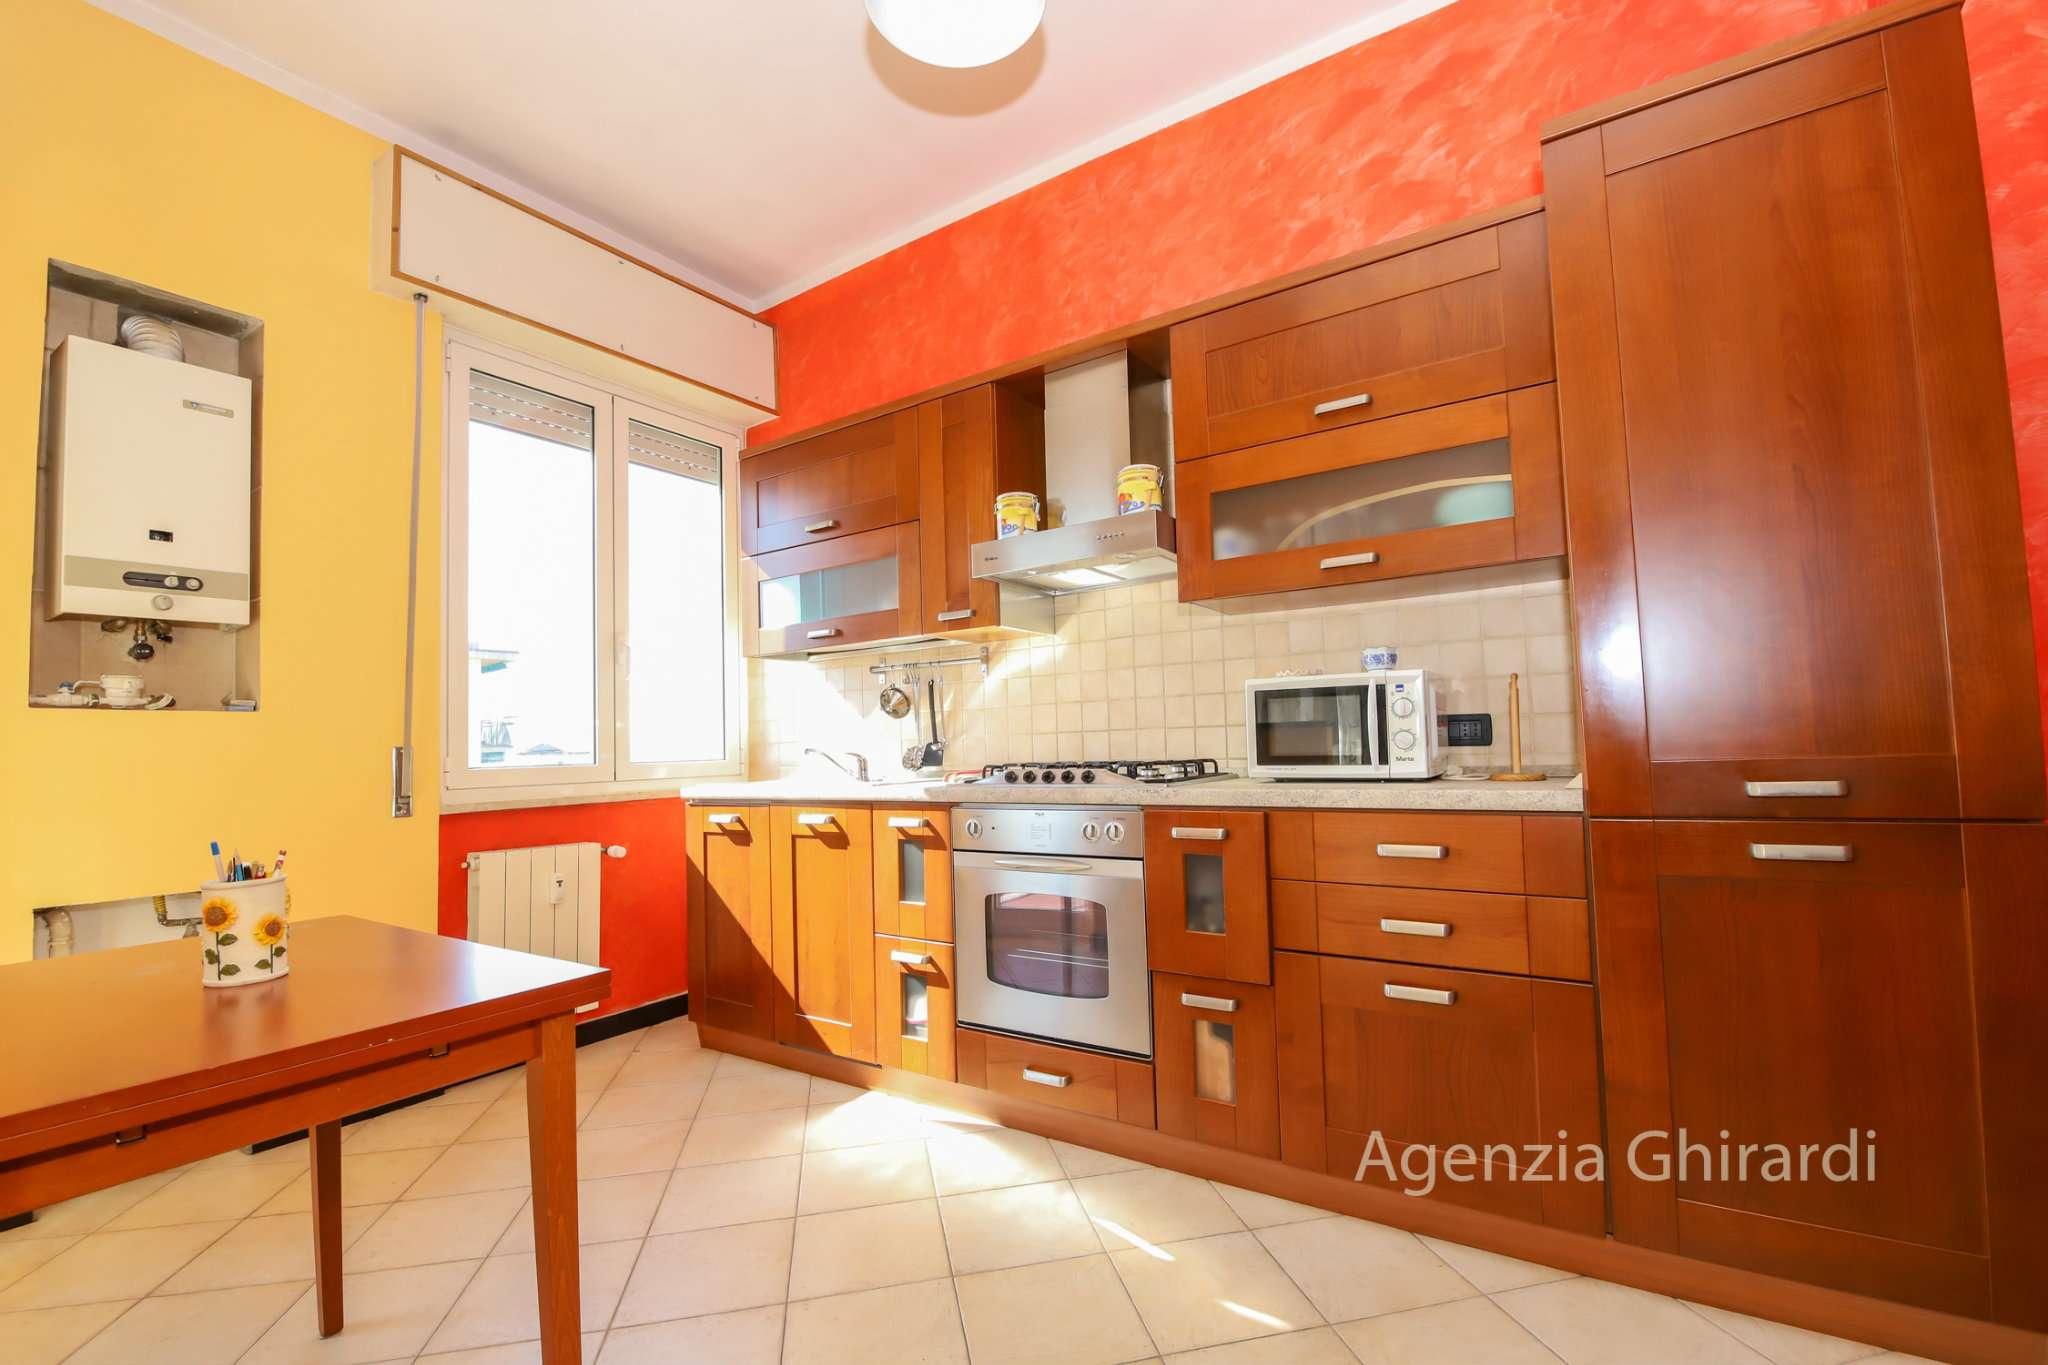 Foto 1 di Bilocale via Diano Marina 19, Genova (zona Prà)